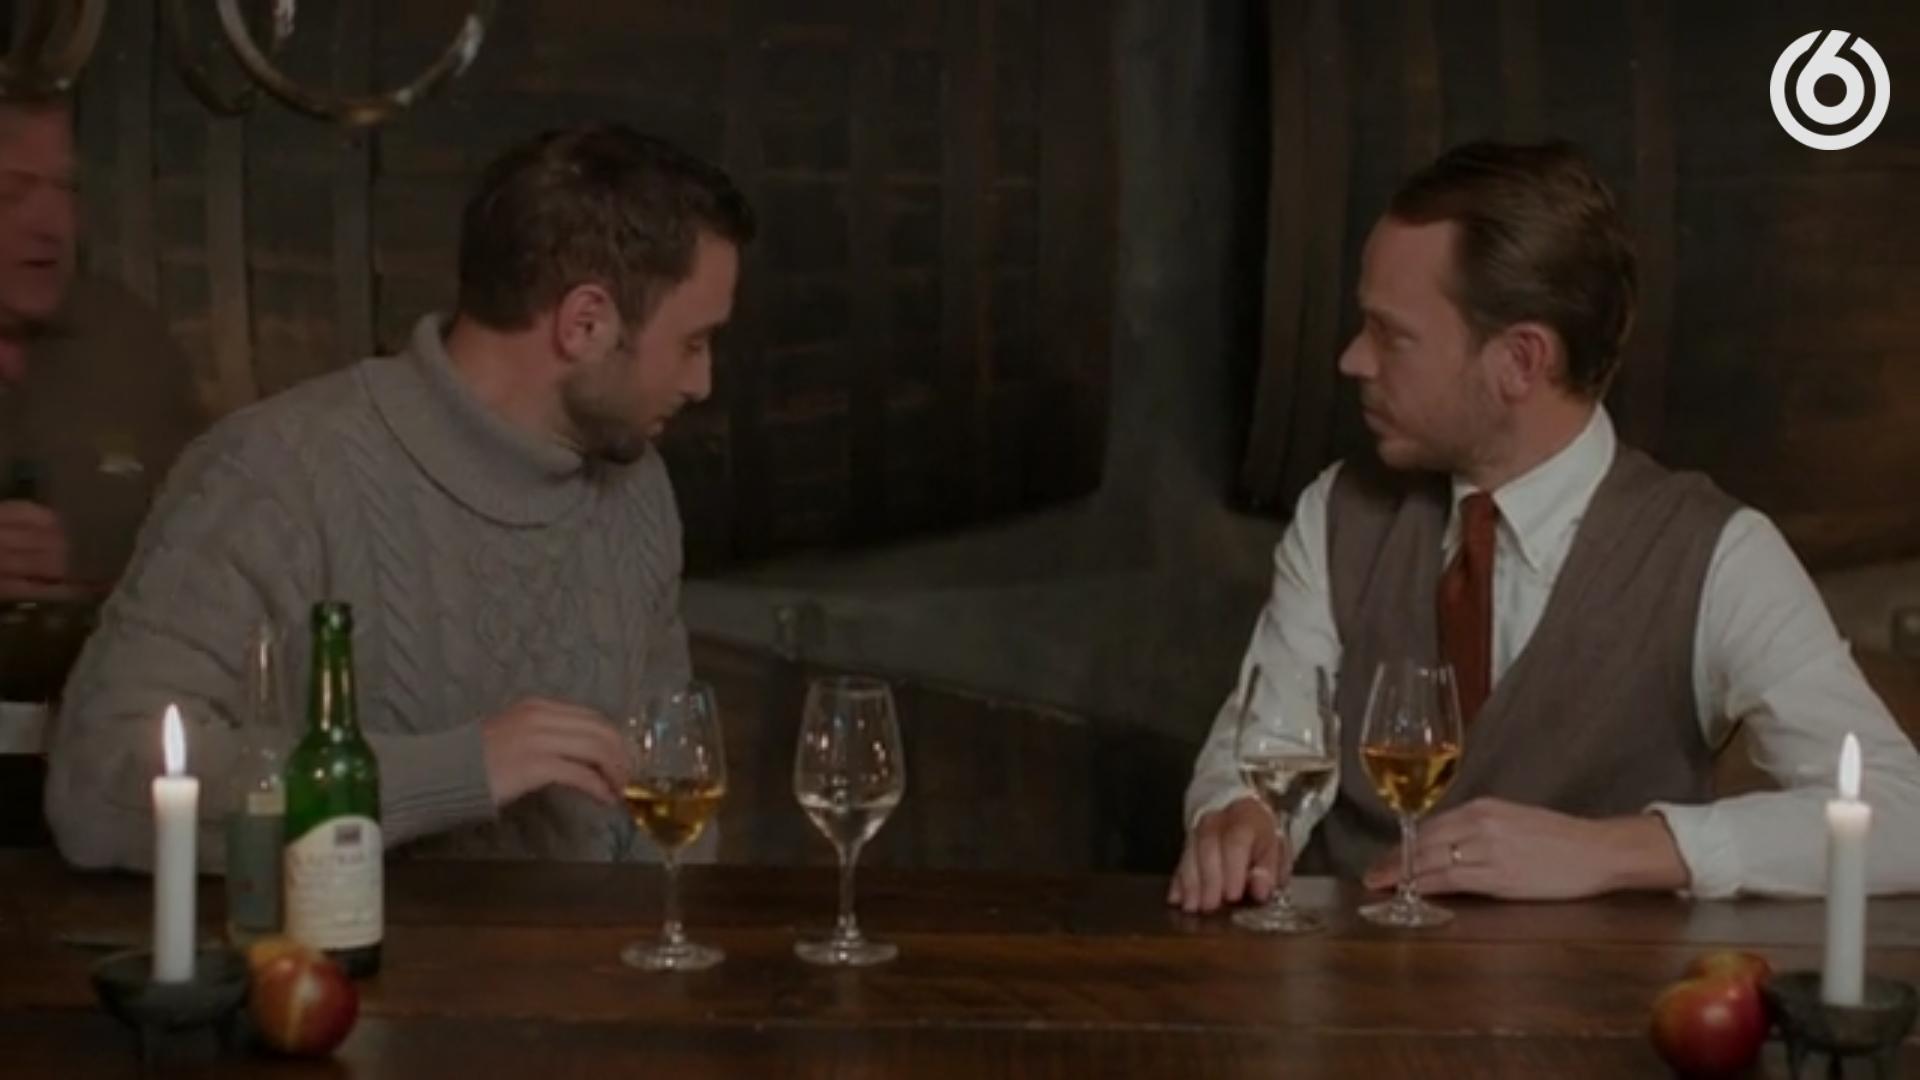 'Chevaleresk' Episode 3 «Skåne»